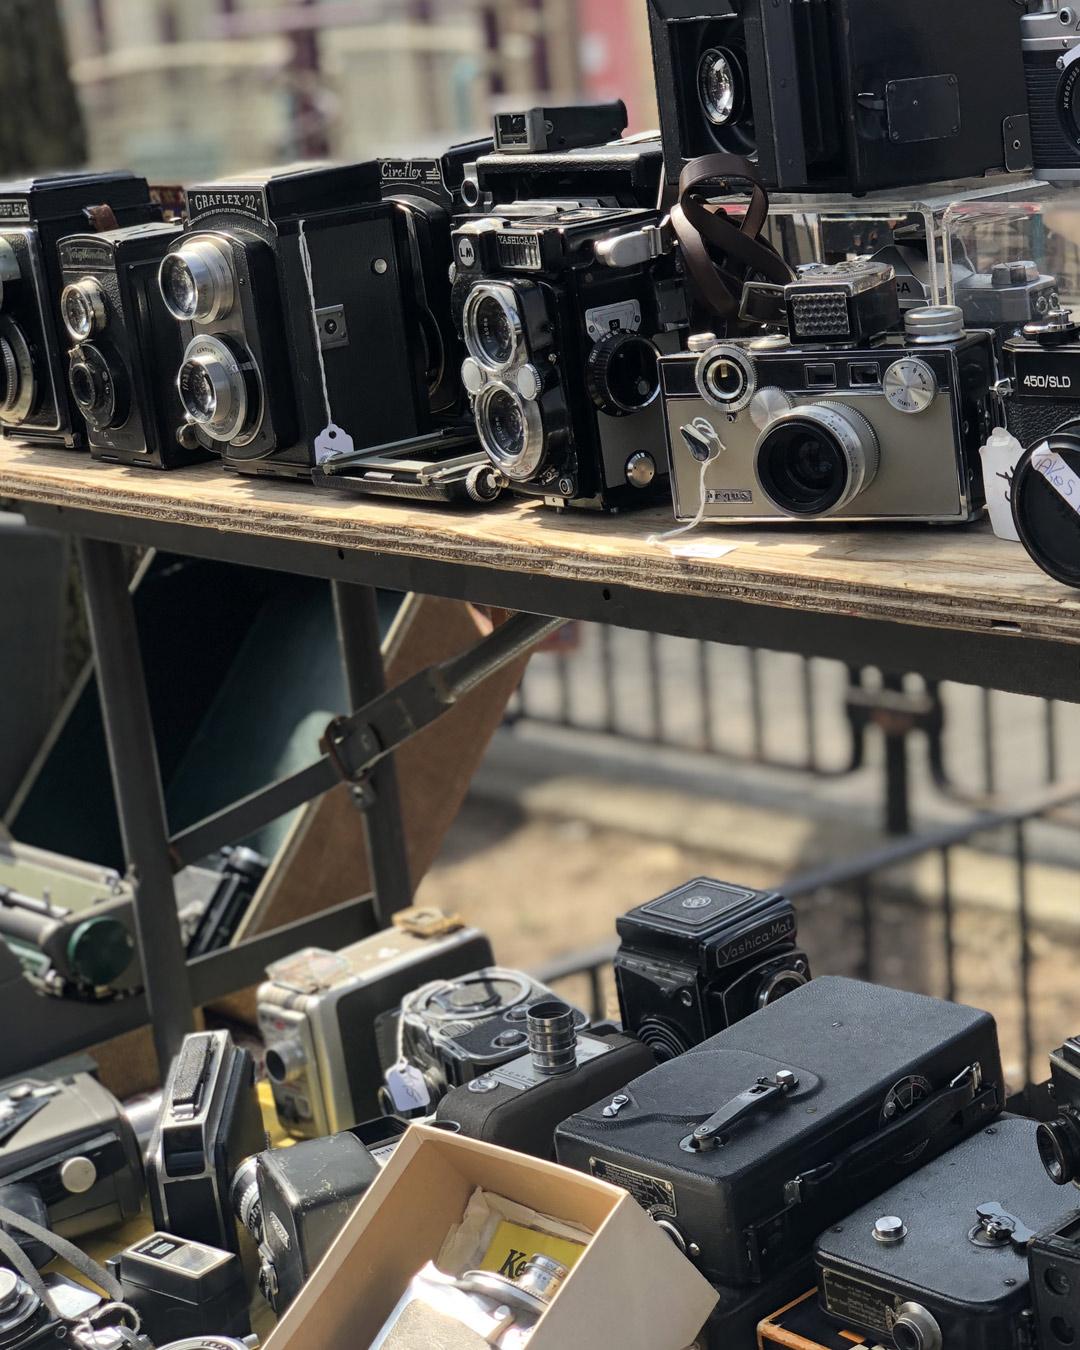 Marketplace Mogul Vendor Selling Antique Cameras